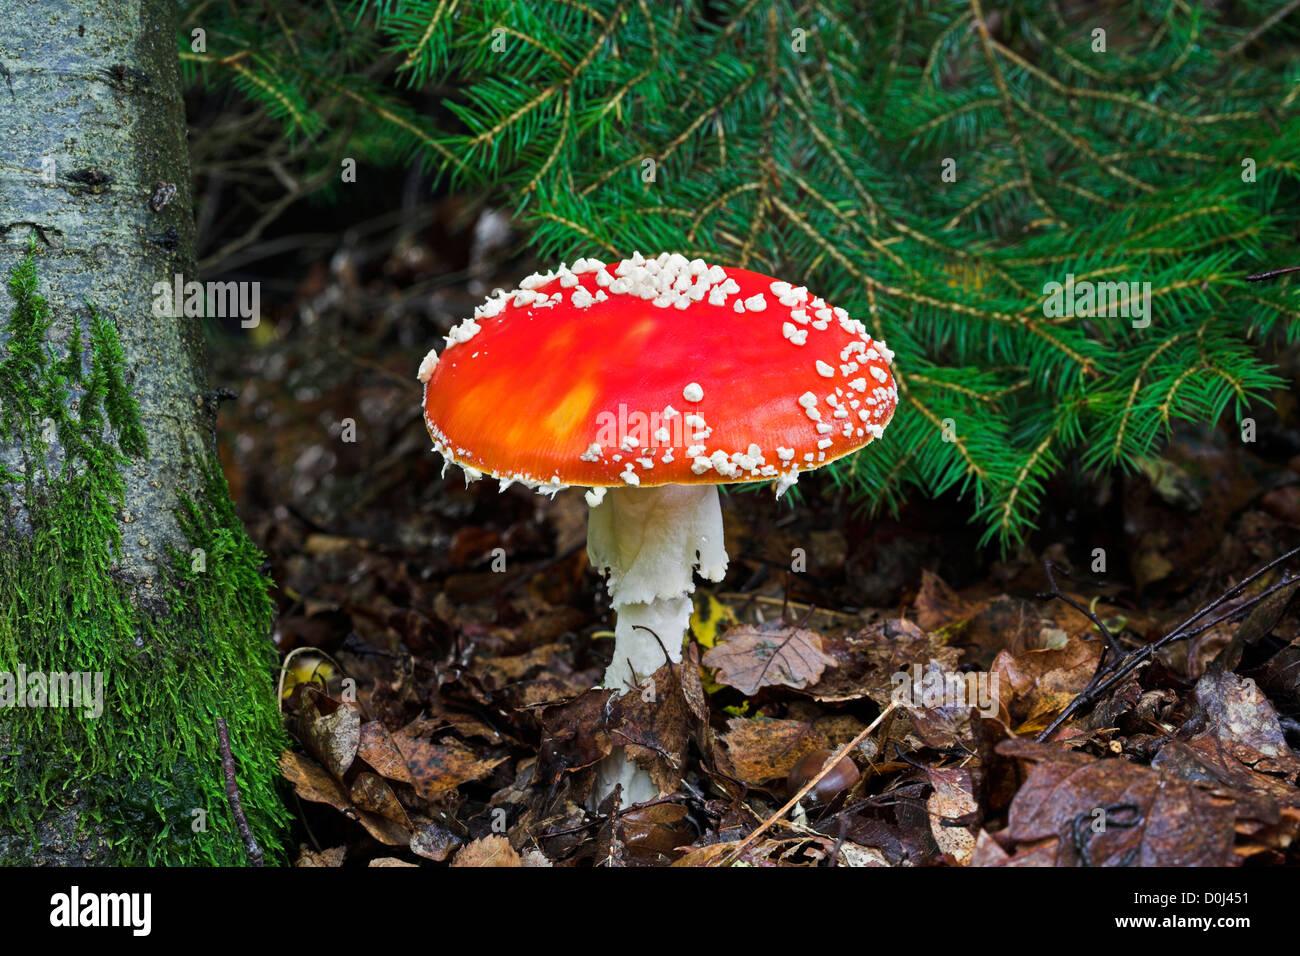 Fly Agaric mushroom on forest floor. - Stock Image